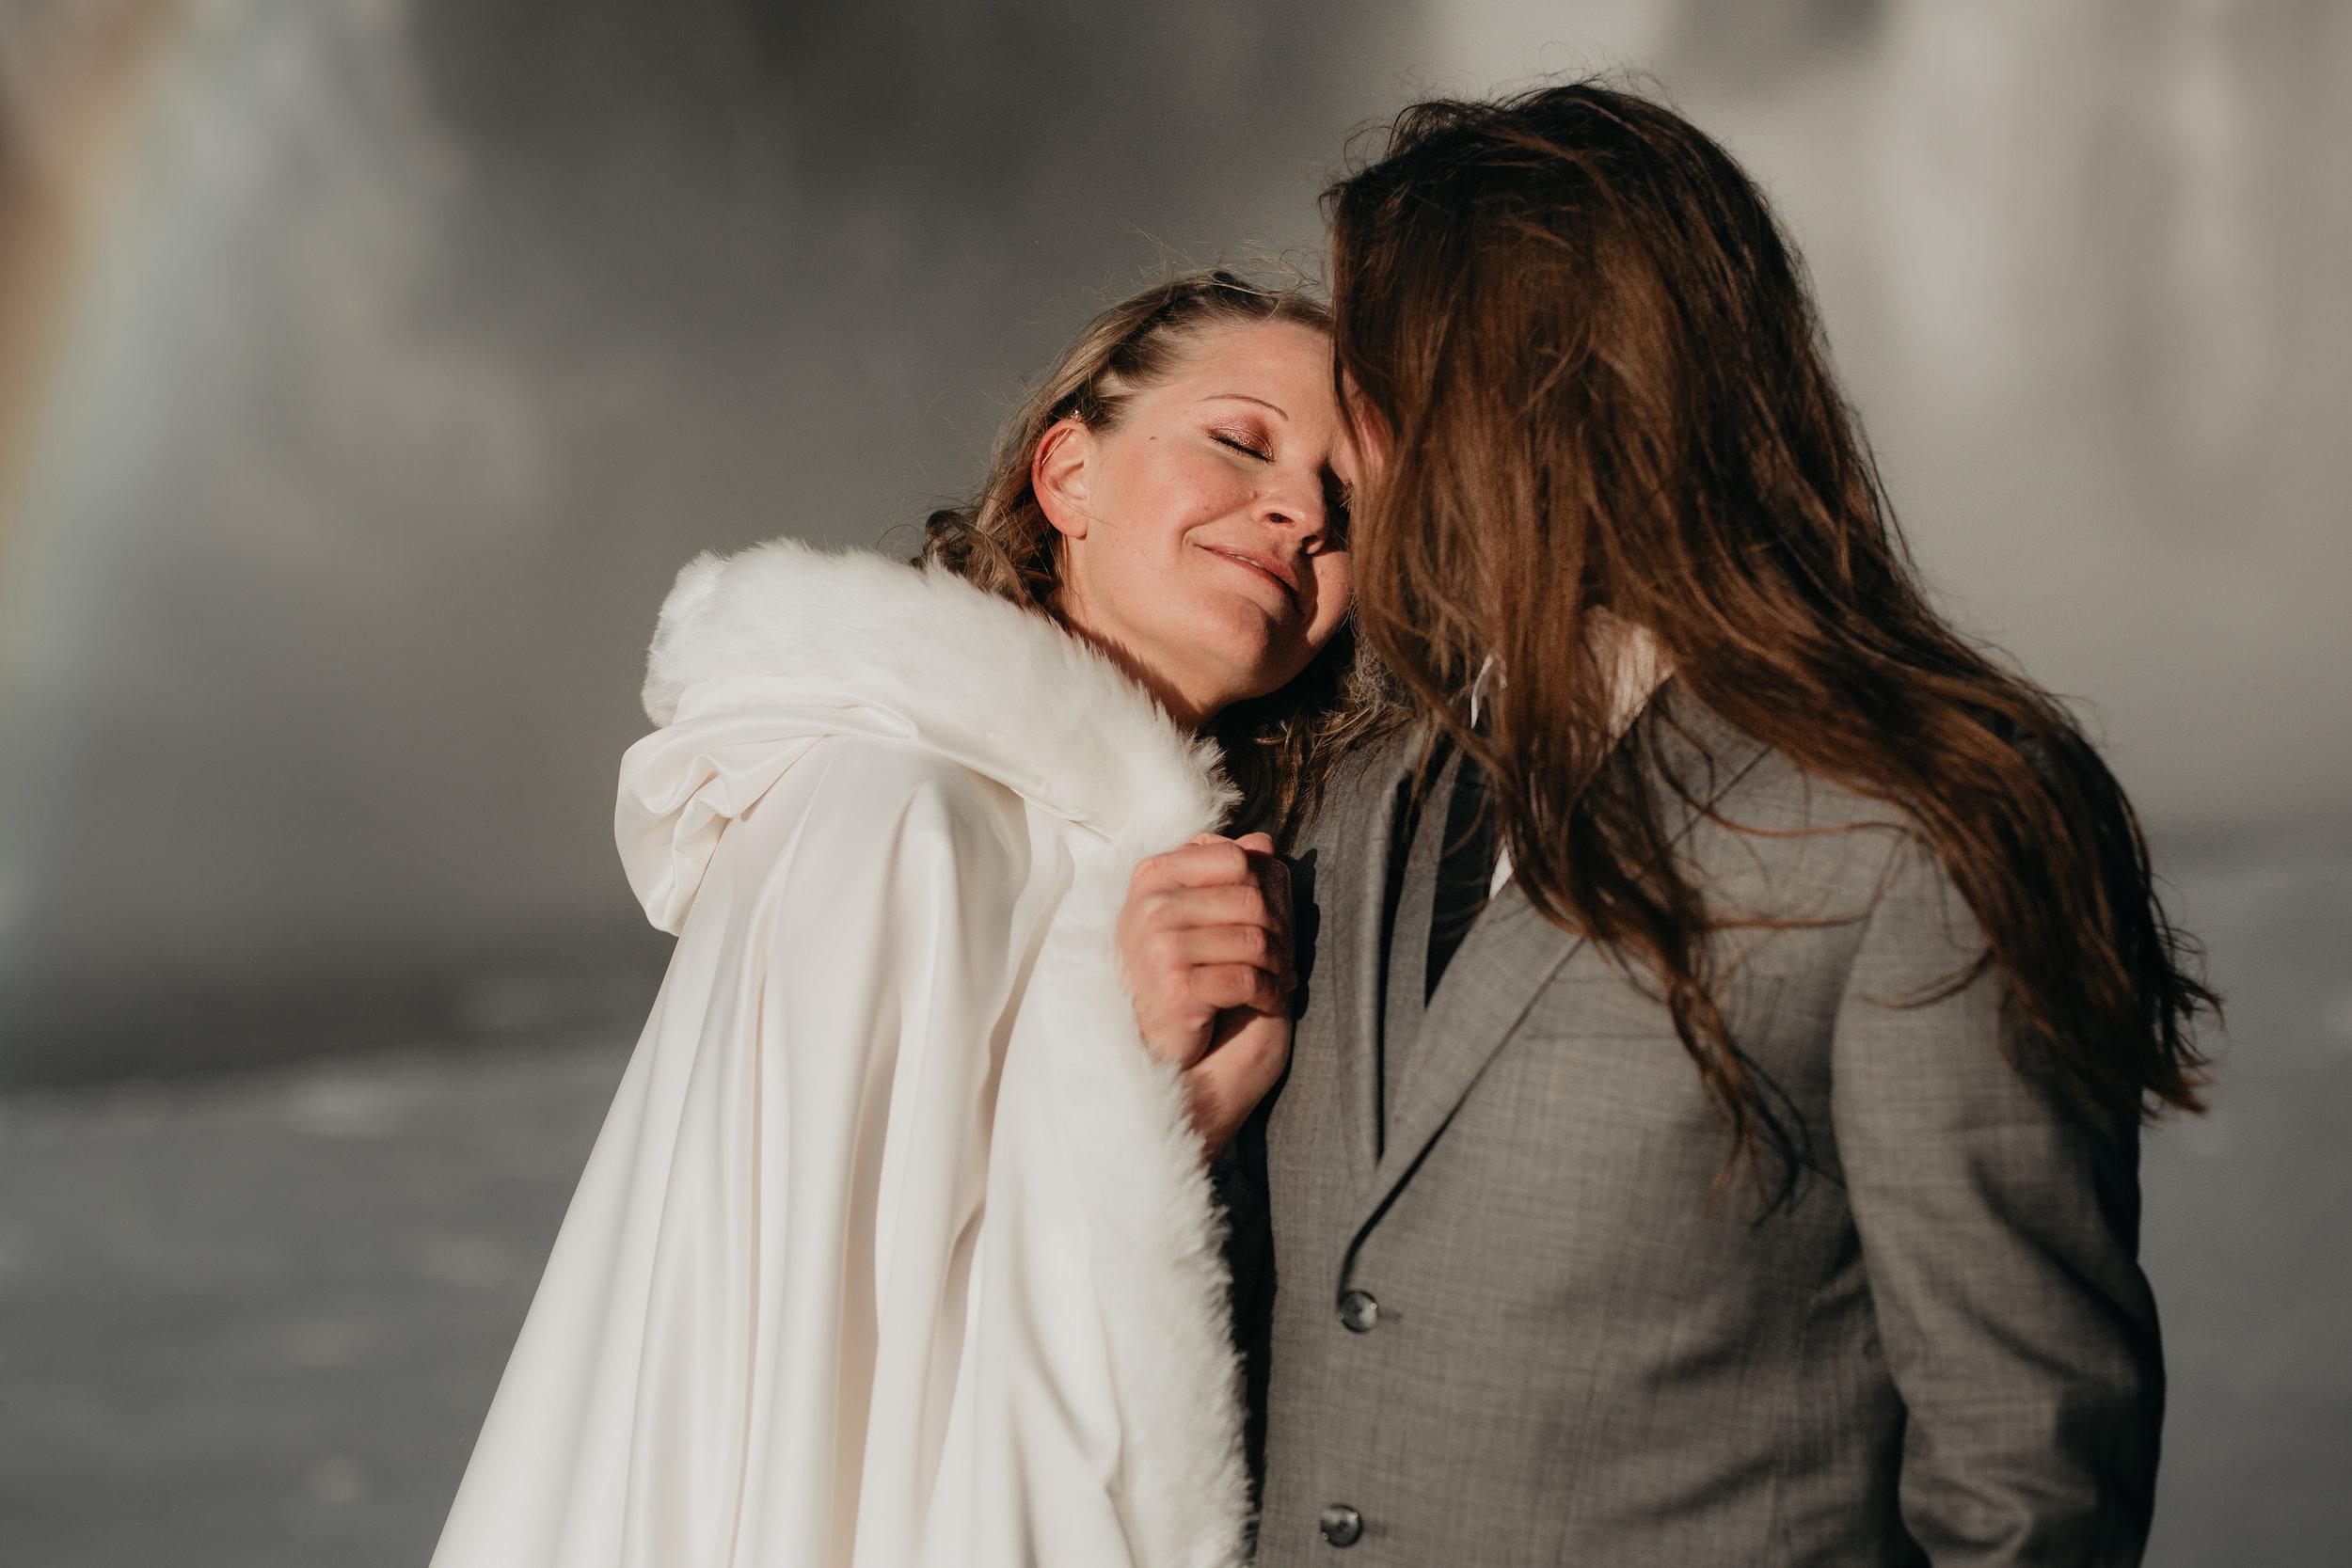 nicole-daacke-photography-iceland-winter-sunset-adventure-elopement-skogafoss-waterfall-black-sand-beach-dyrholaey-vik-iceland-intimate-wedding-black-church-elopement-photographer-10.jpg